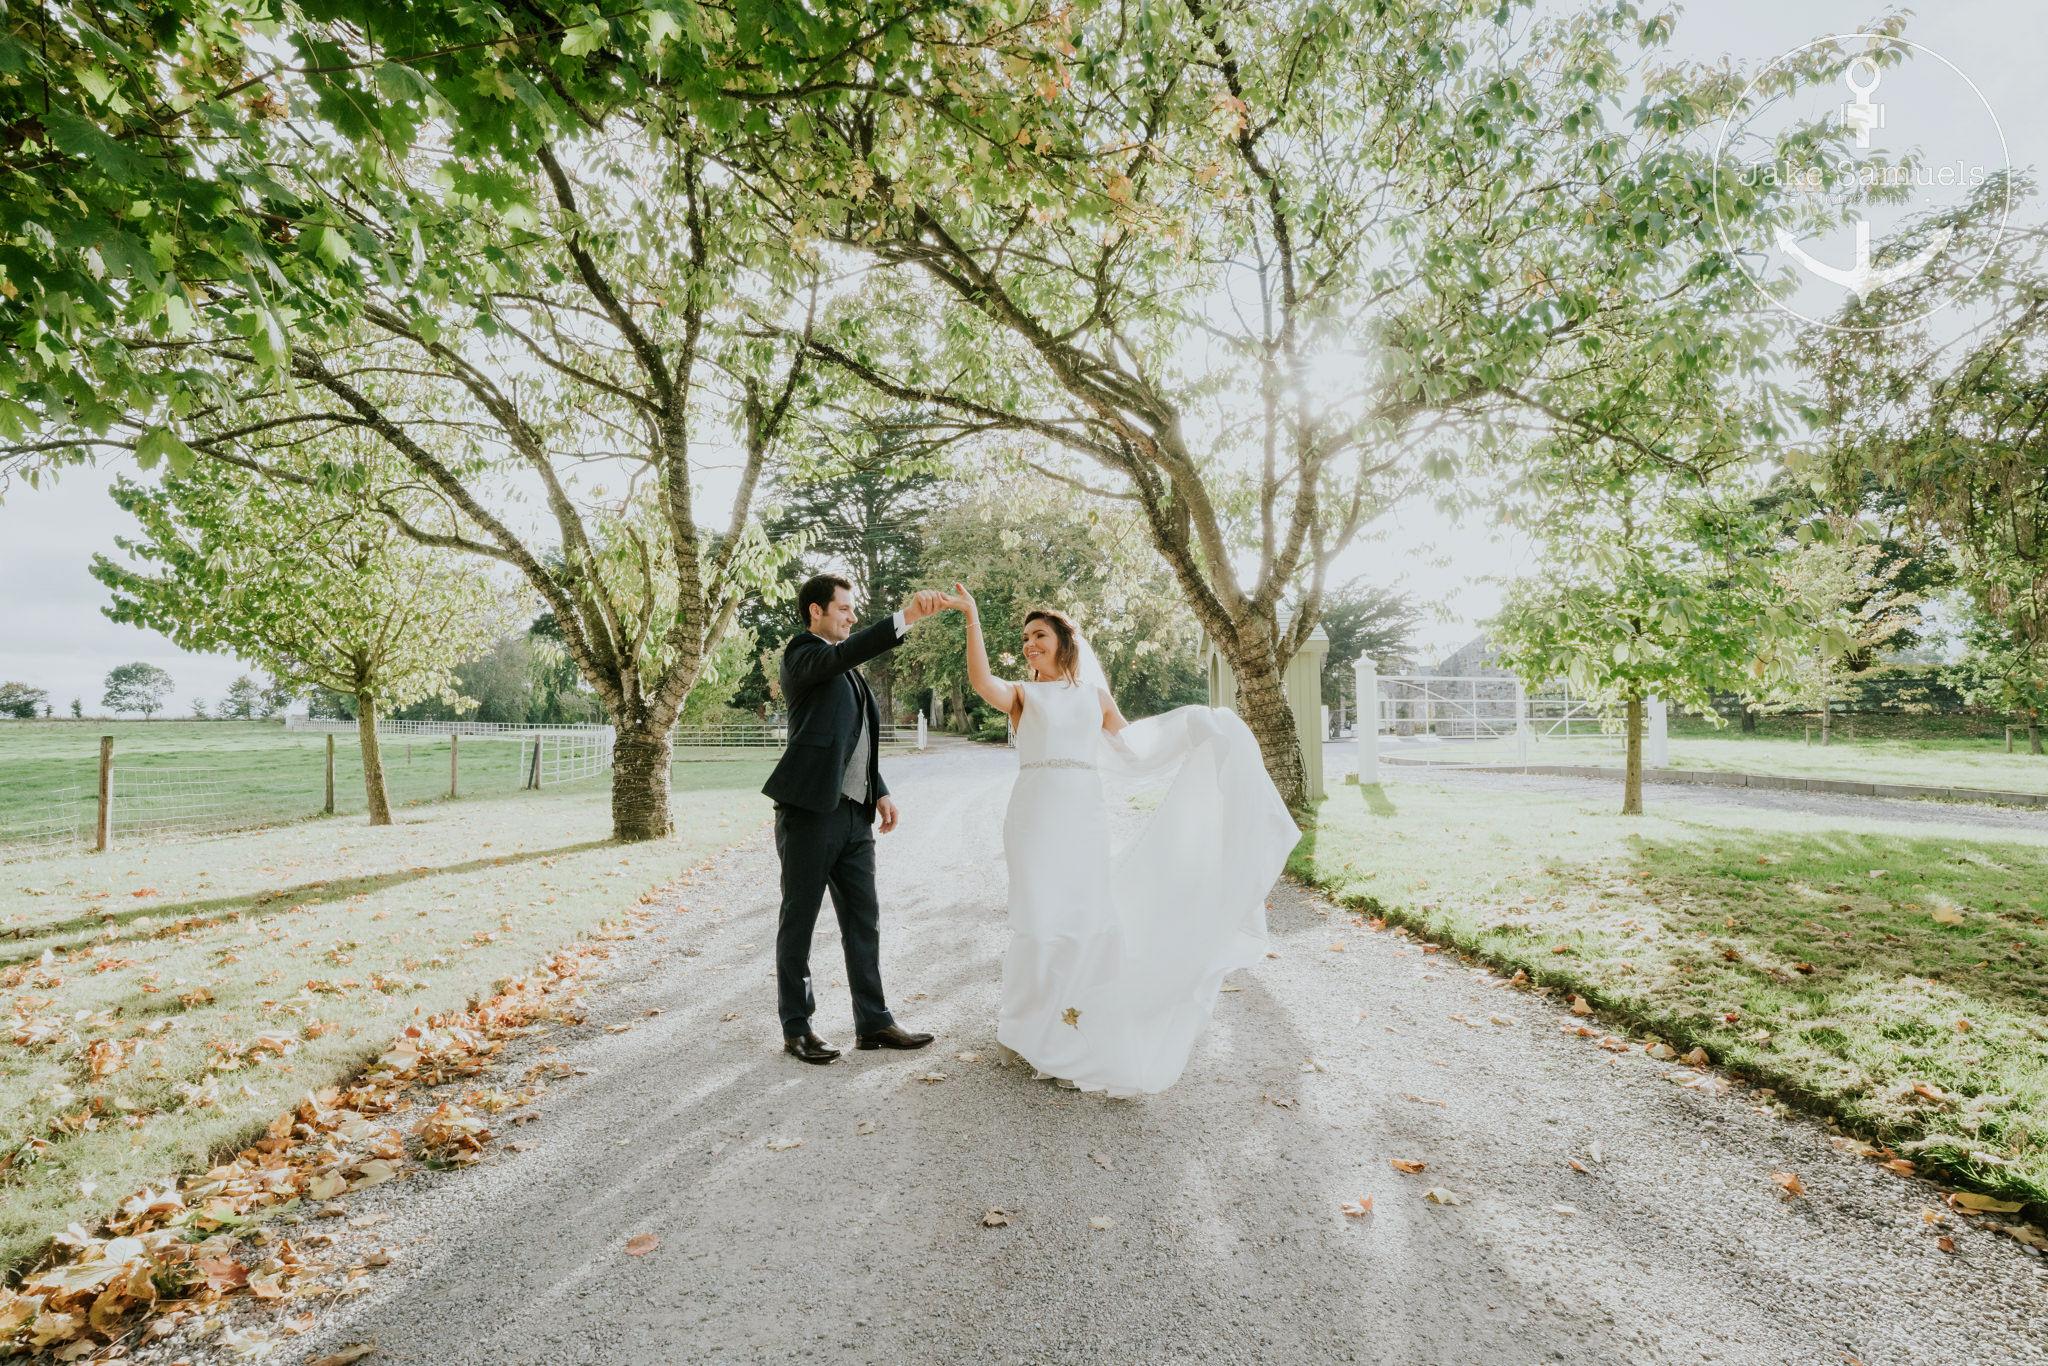 wedding photography ballymagarvey village by Jake smauels